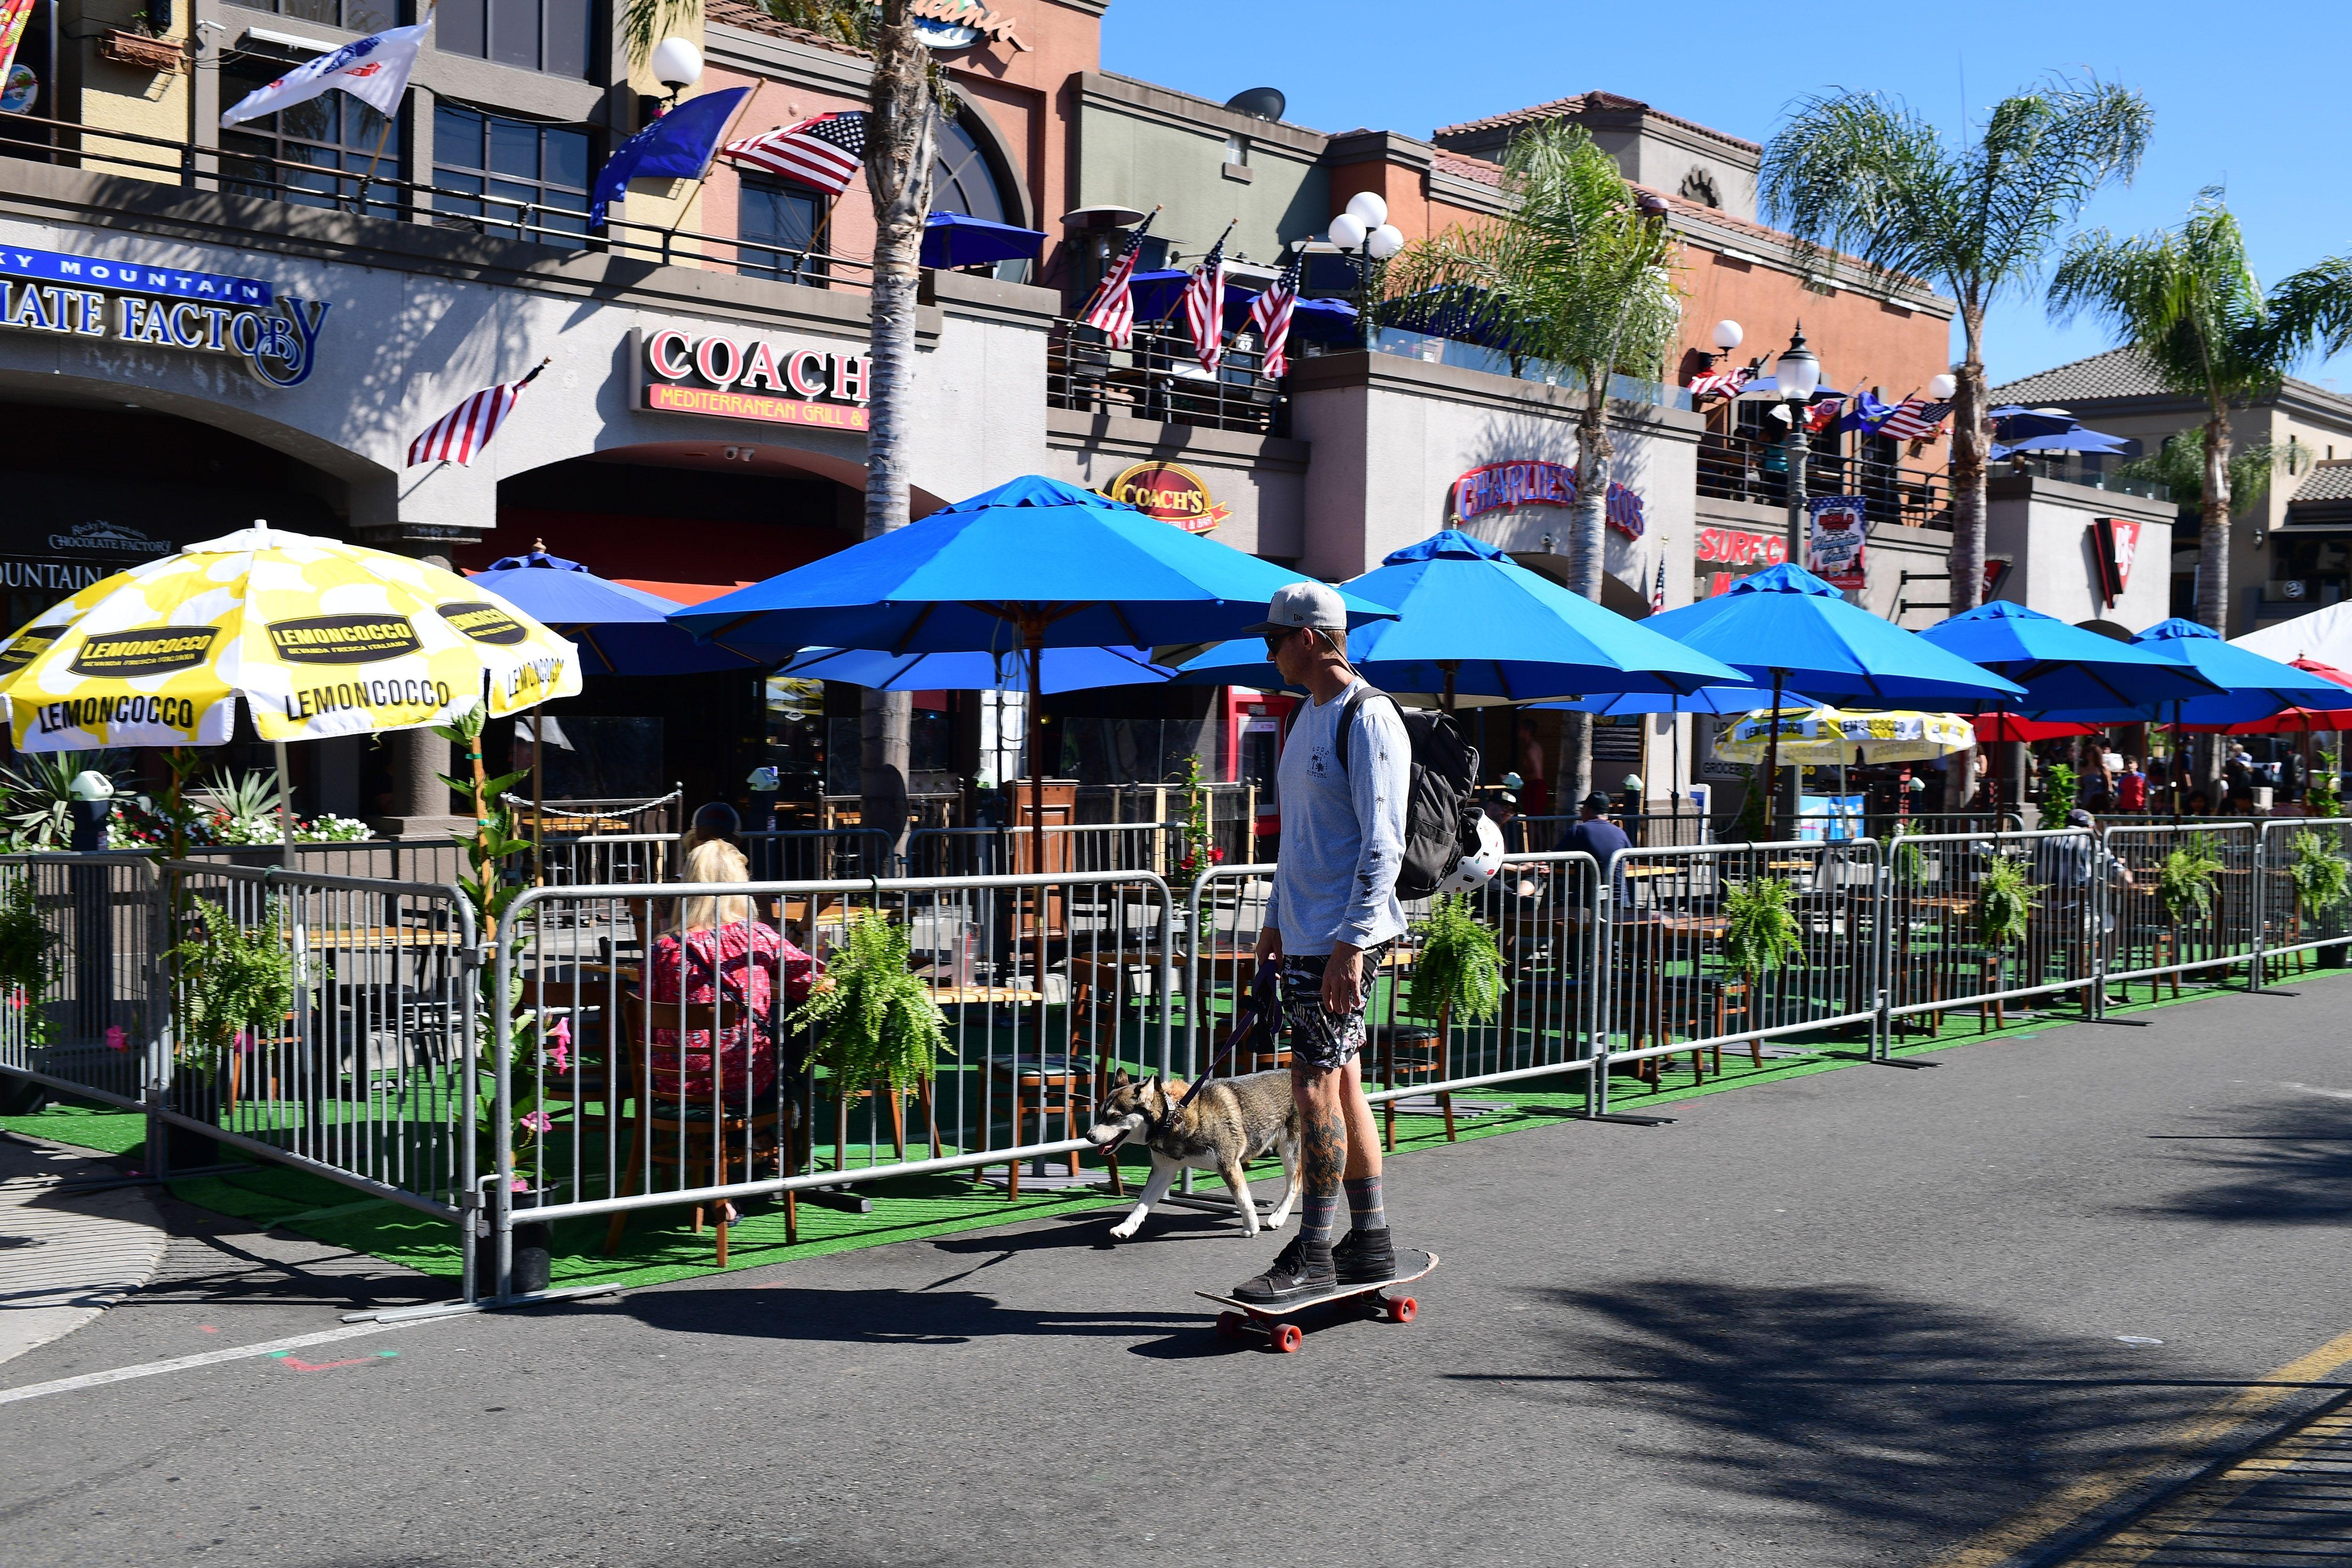 Restaurants set up outside tables in Huntington Beach, California.